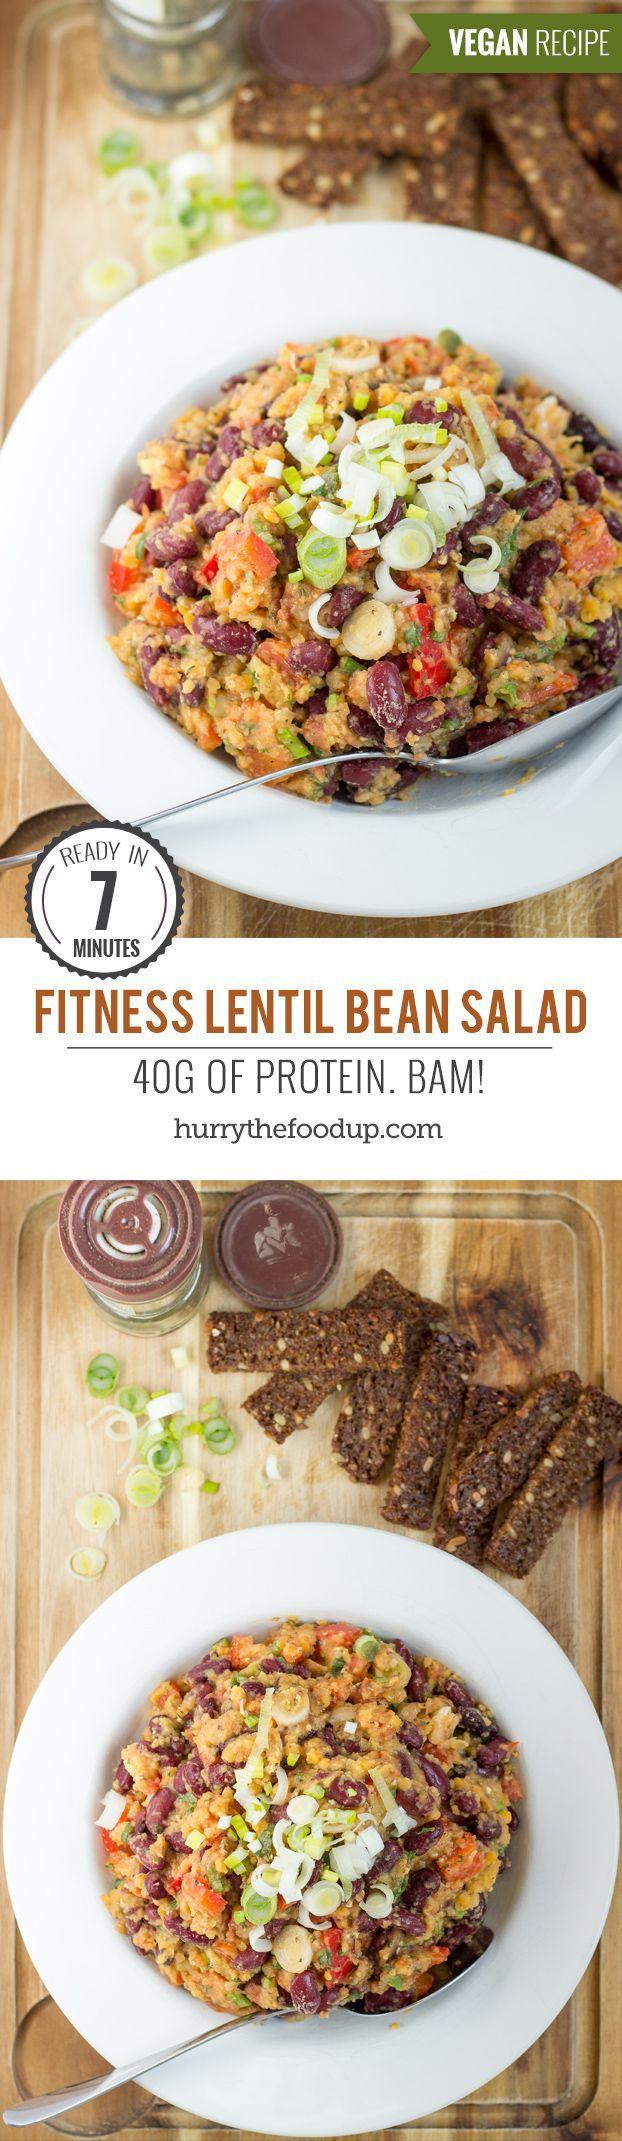 Fitness Lentil Bean Salad. 40g per bowl. Ready in 7 minutes | #vegetarian #workout | http://hurrythefoodup.com